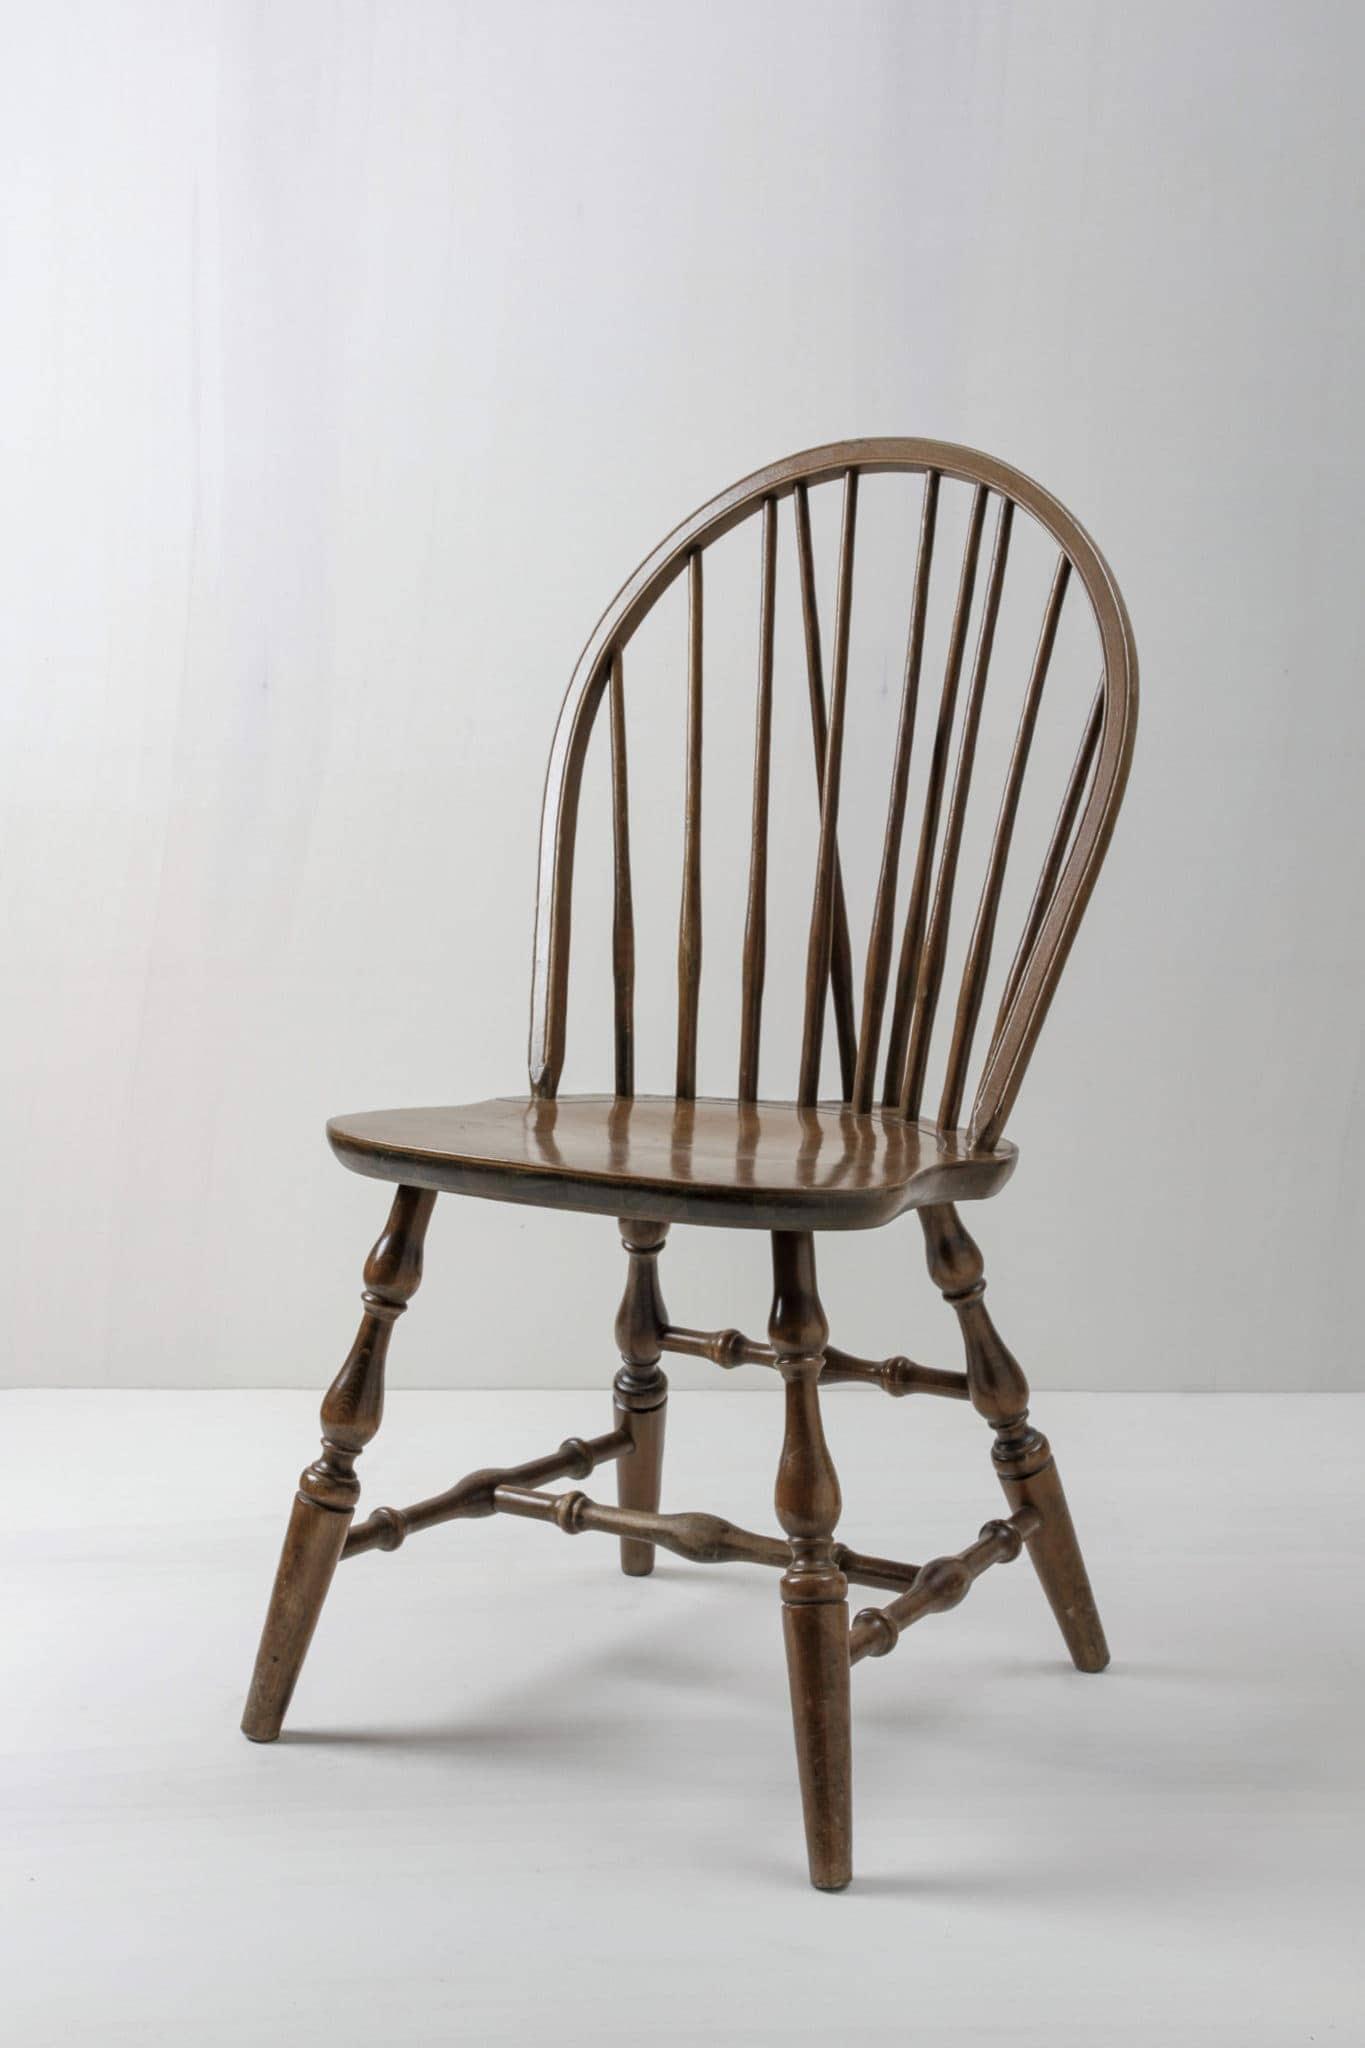 englischer Sprossenstuhl im Windsor Design. Mietmöbel besonderes Design Berlin.